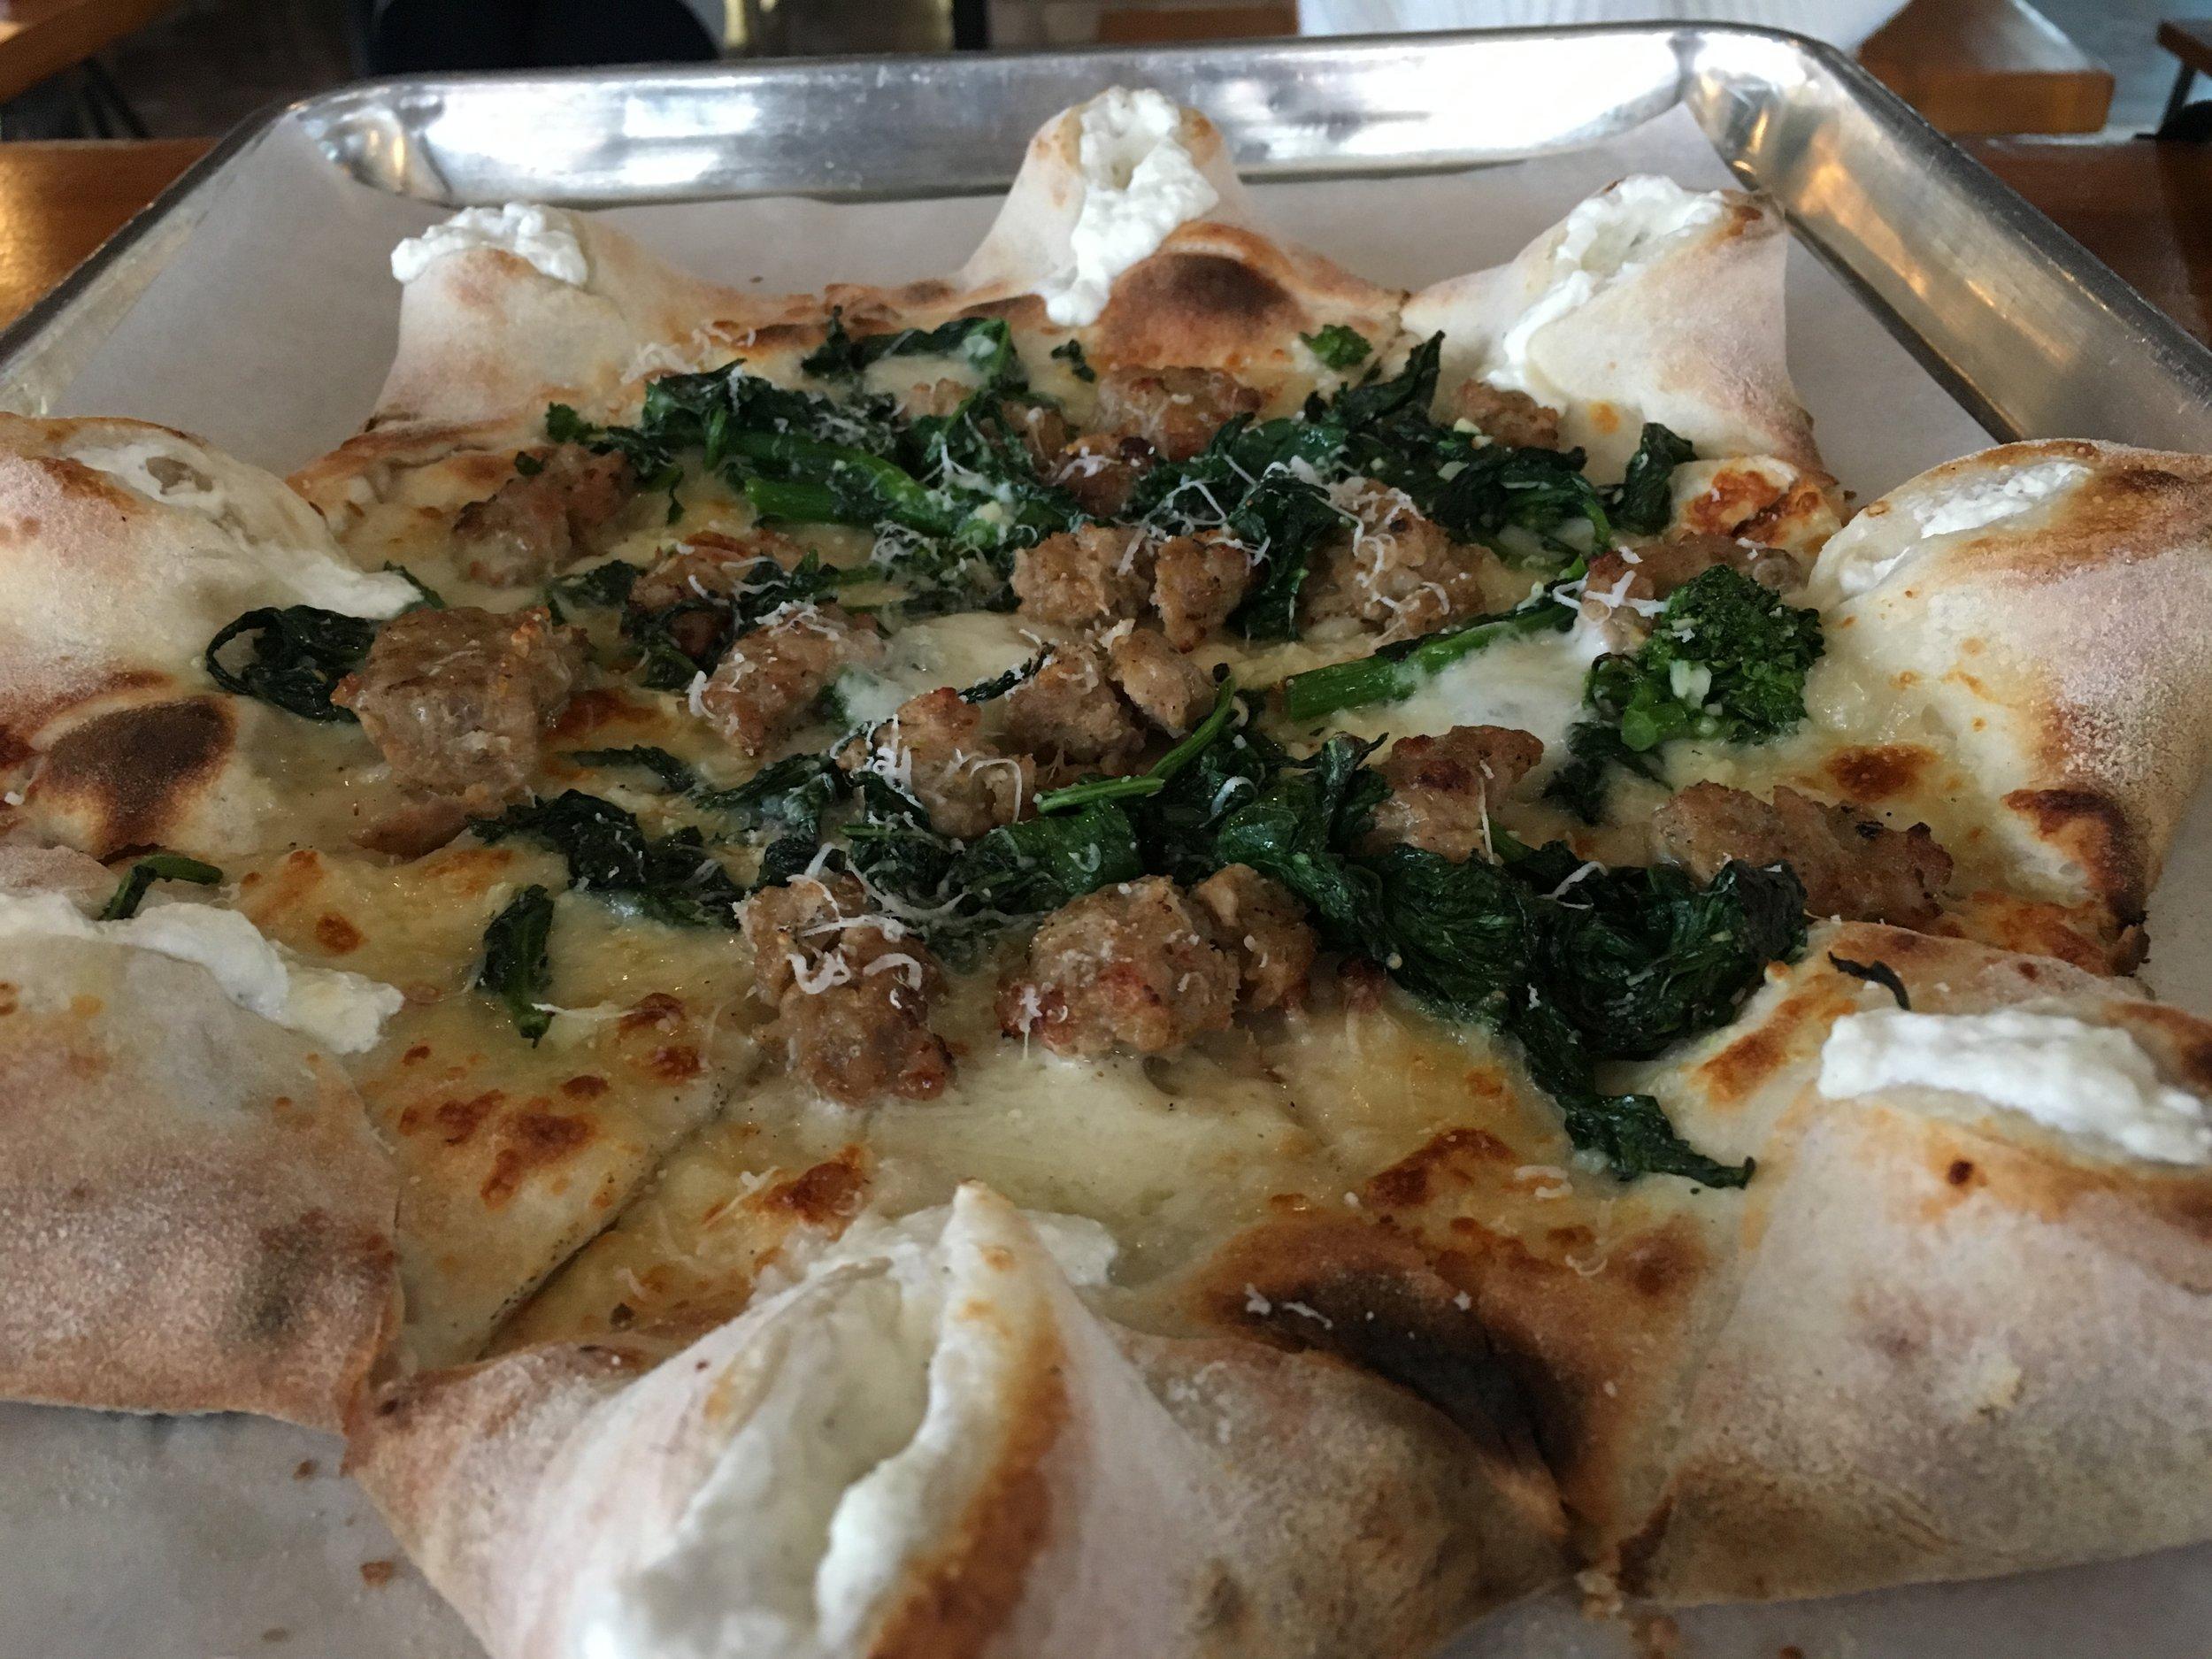 NAPOLETANA  - Broccoli rabe, sausage, scamorza, mozzarella di bufala, pecorino romano